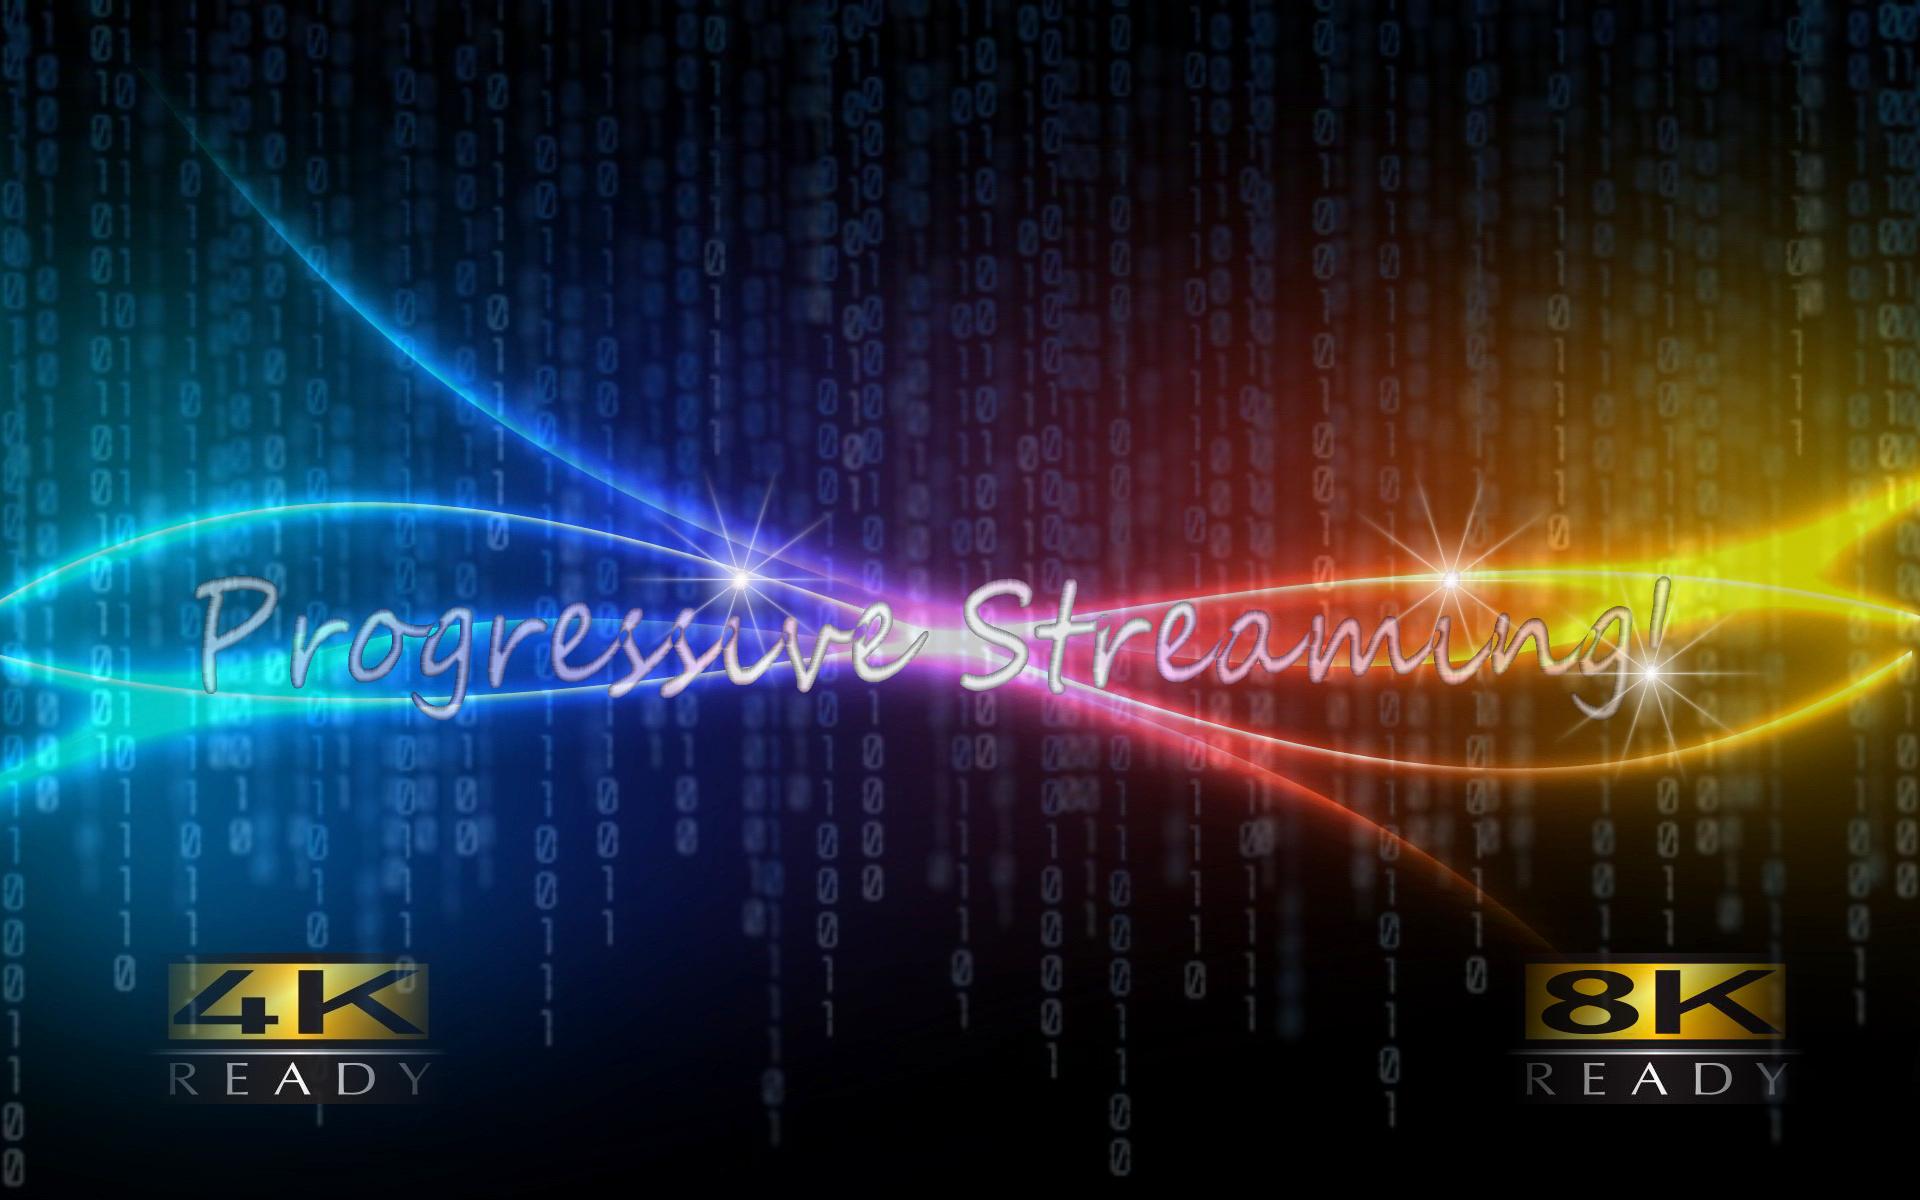 [recovery mode] Технология Progressive Streaming, или как смотреть 4k видео по сети, без фризов